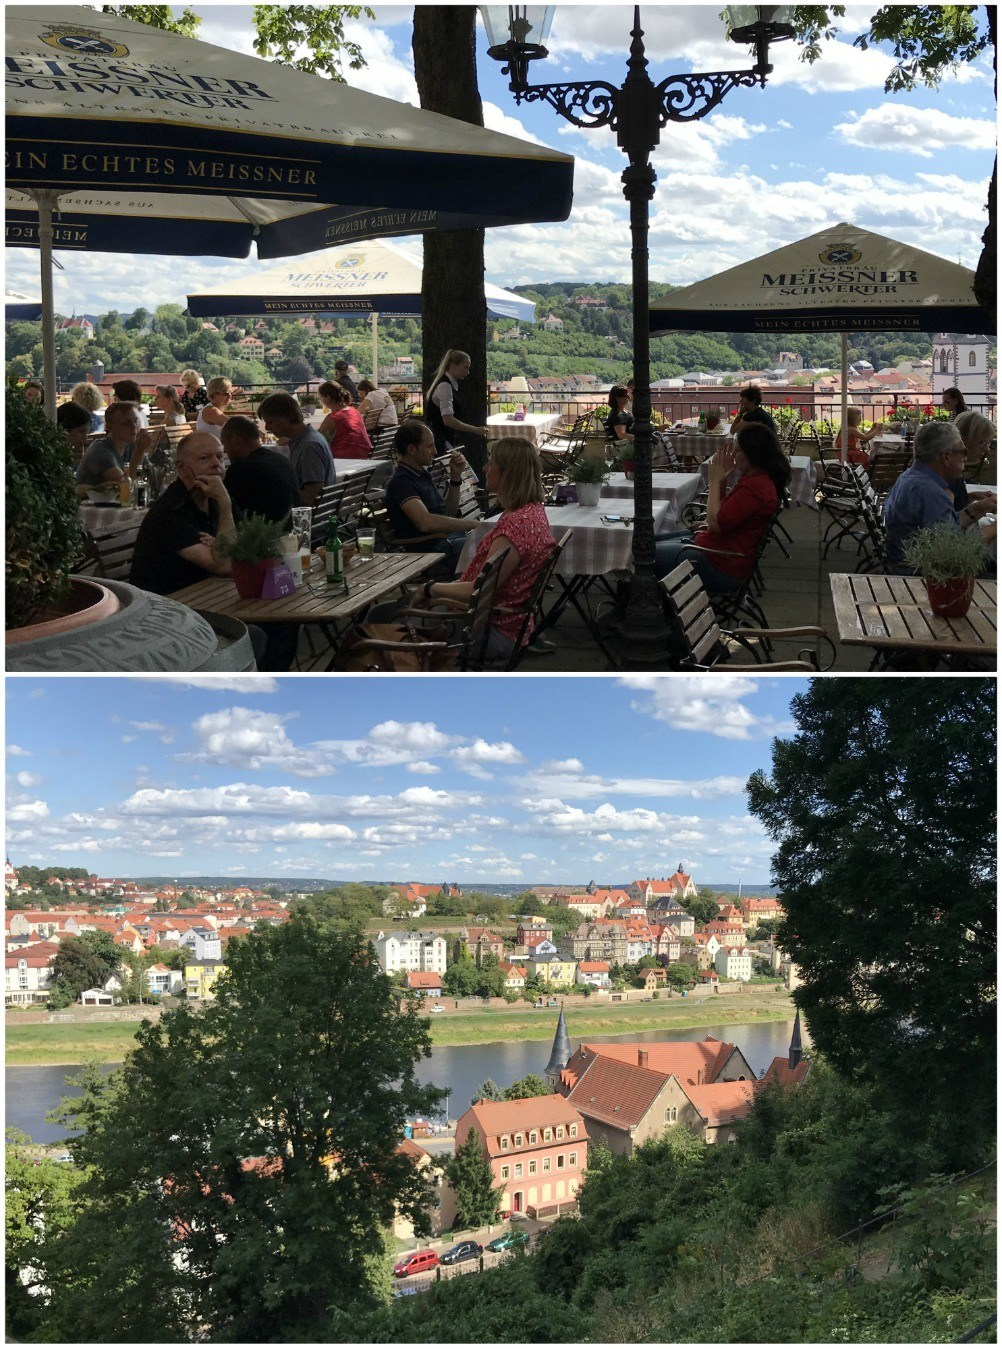 Views from cafe terrace in Meissen in Saxony, Germany Photo Heatheronhertravels.com